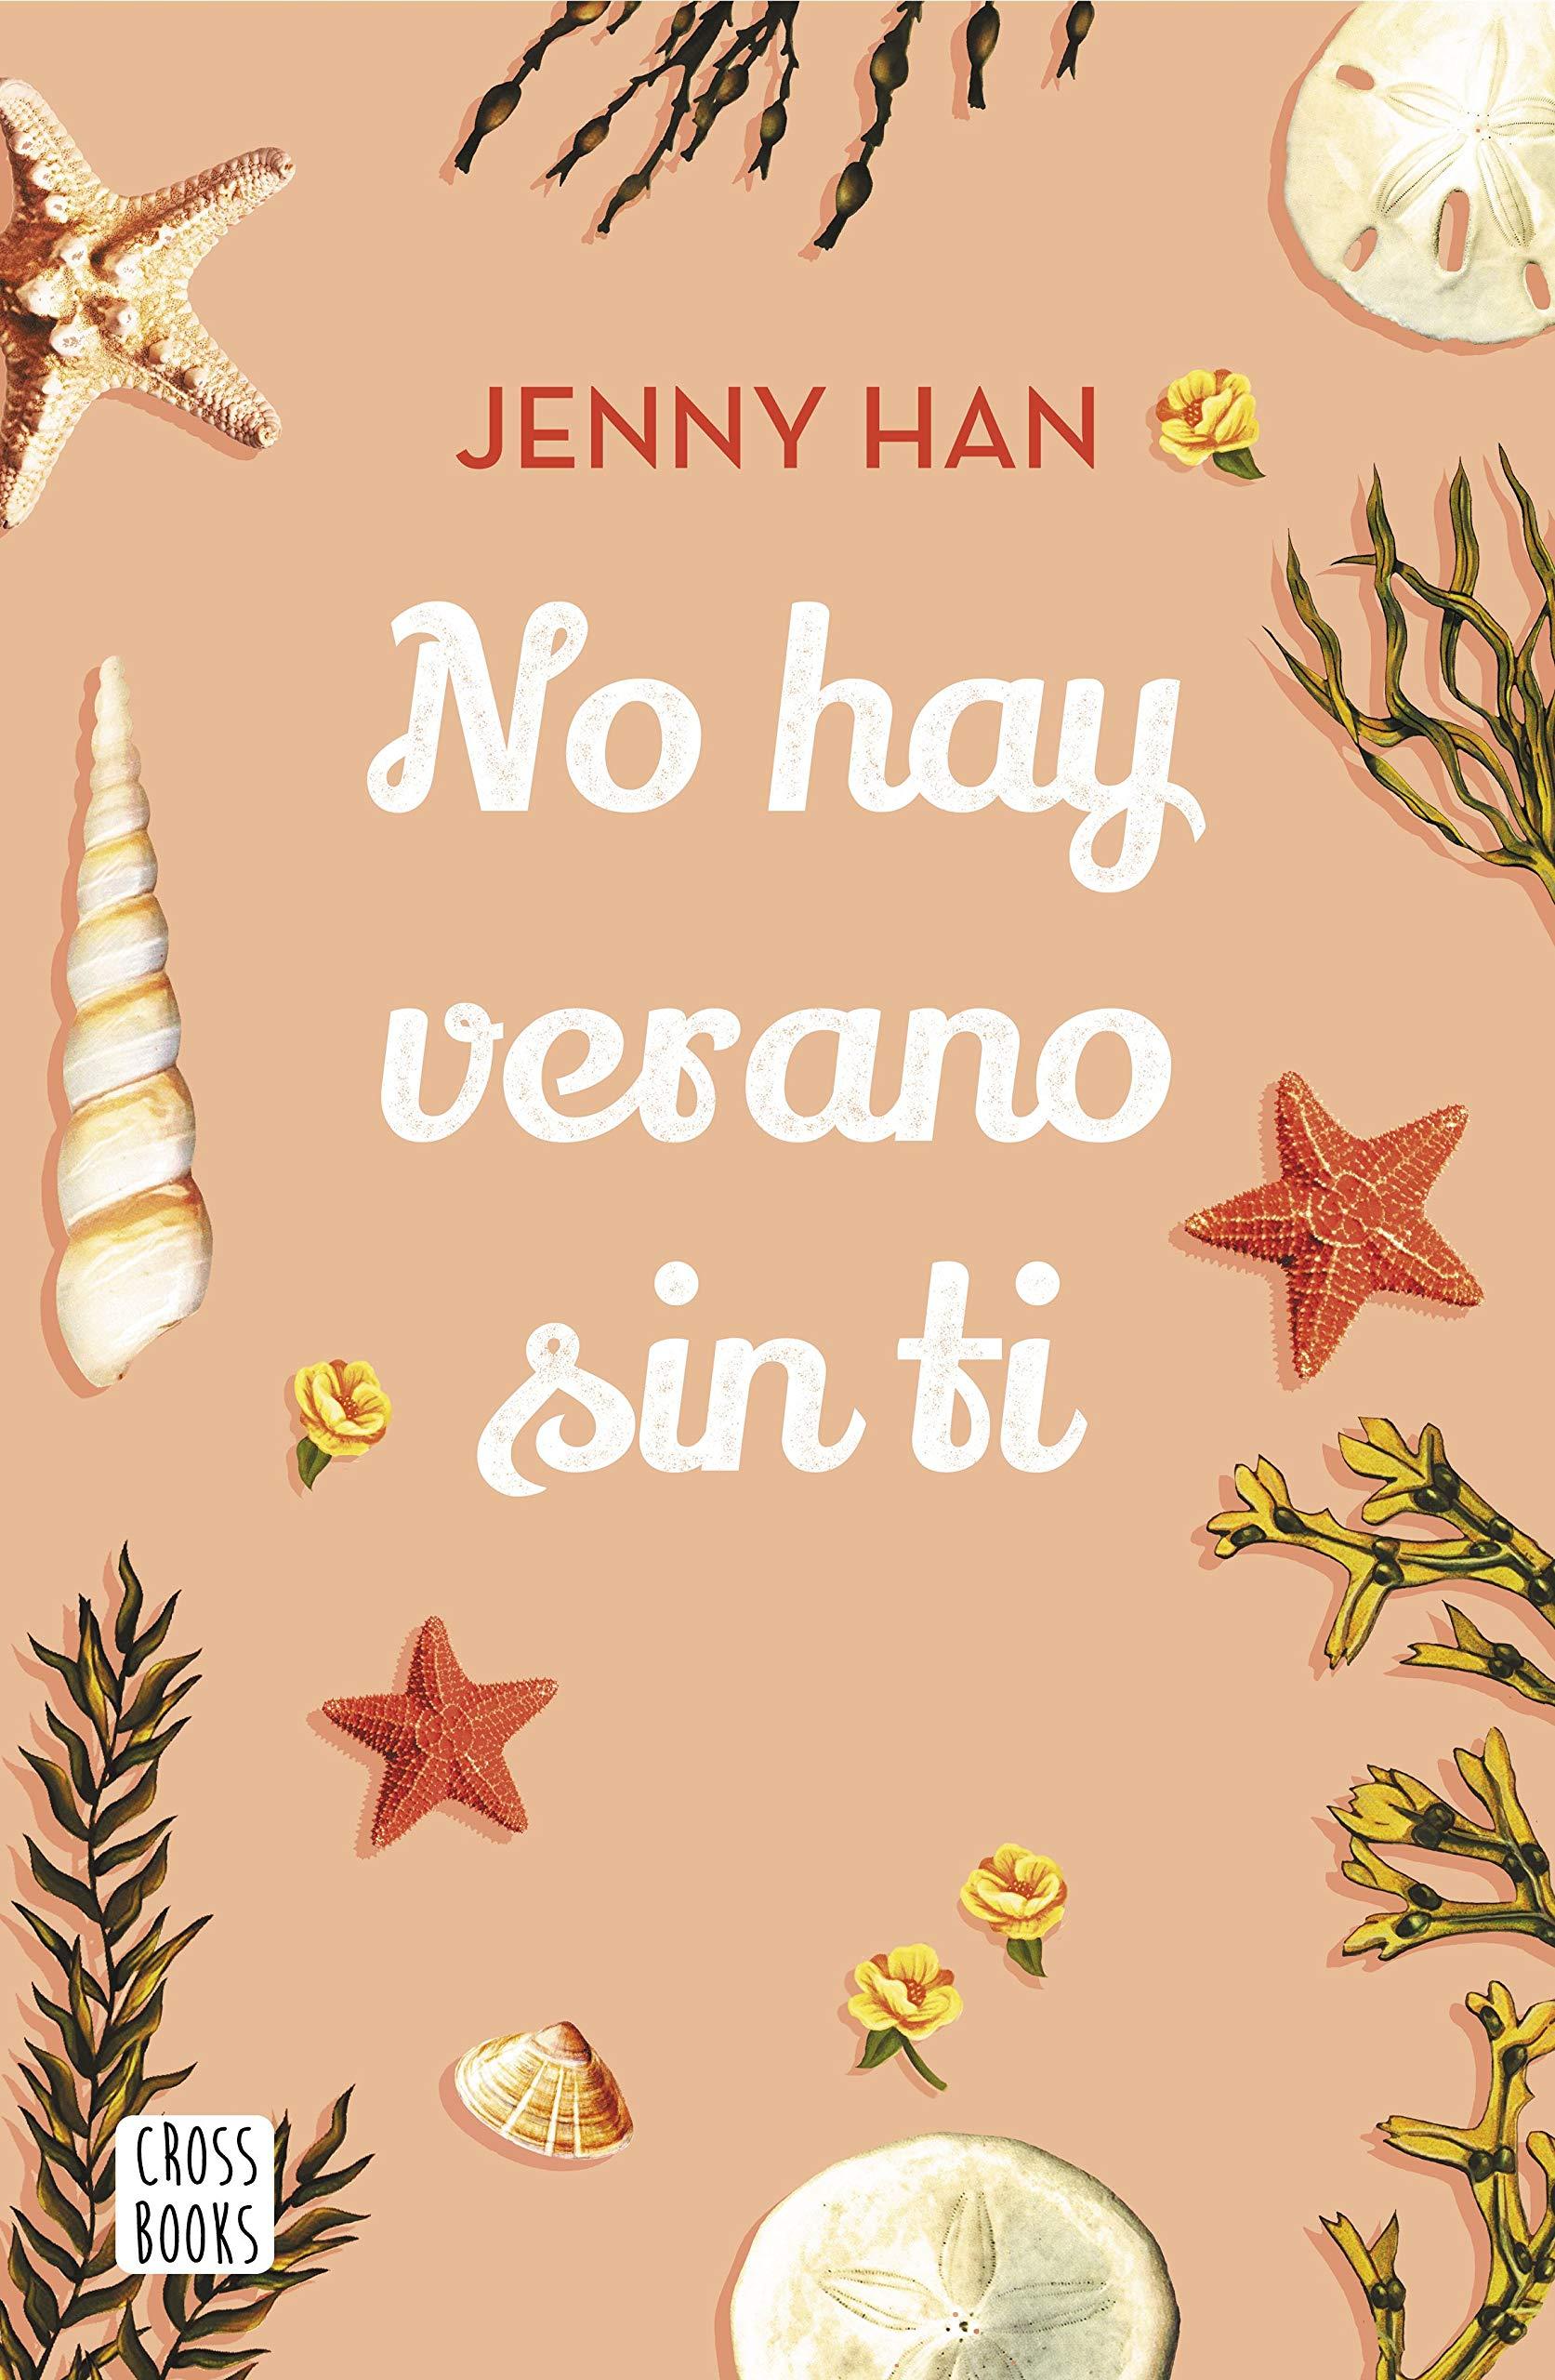 No hay verano sin ti (Crossbooks) por Jenny Han